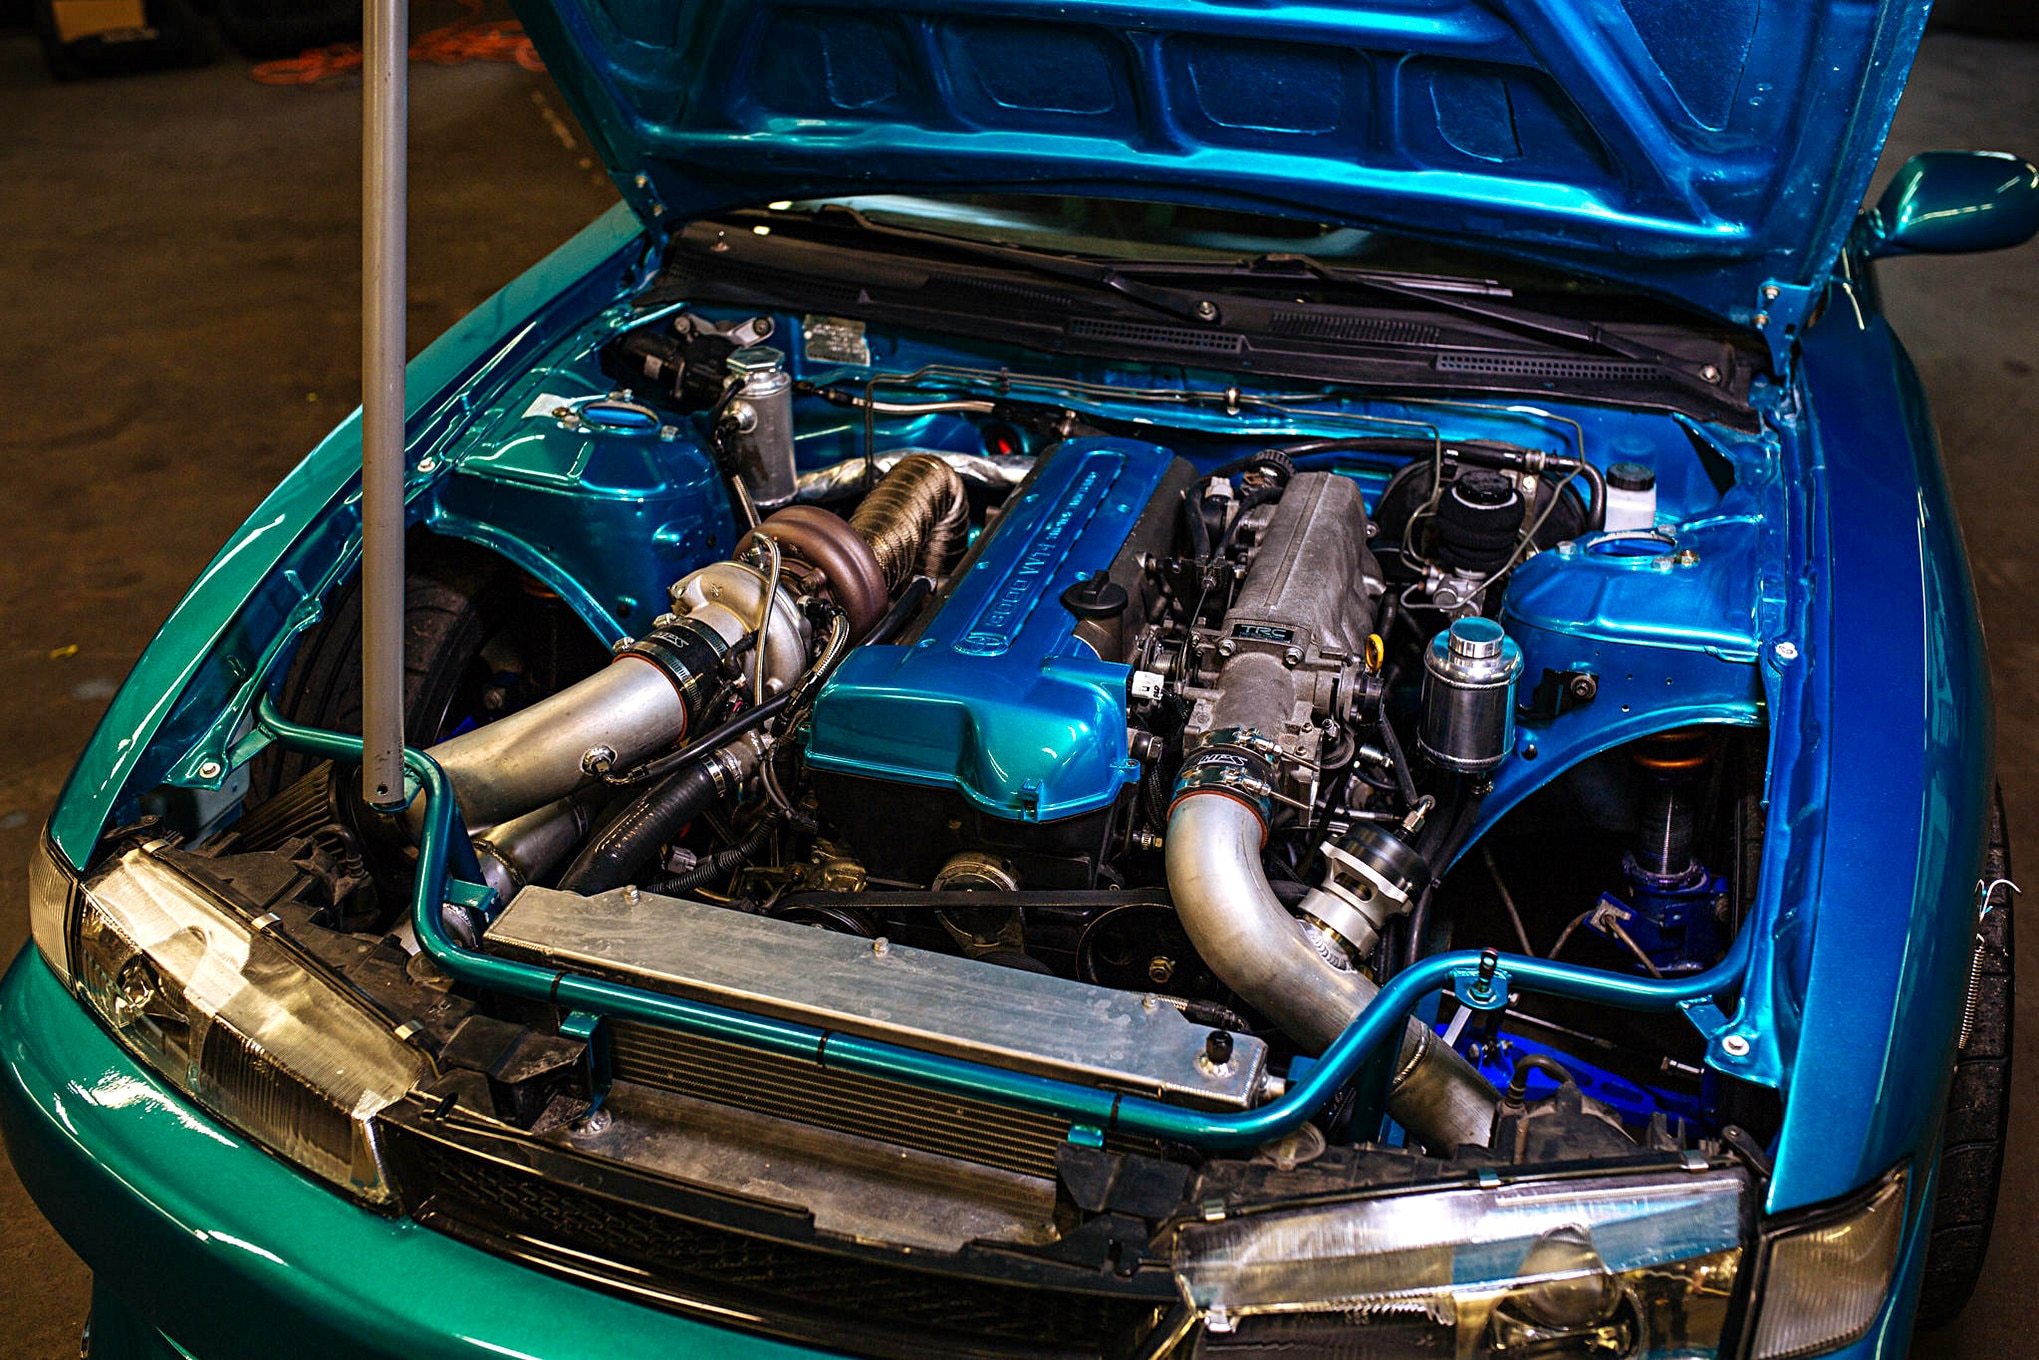 Diagram Diagram For Engine Of 1995 Nissan 240sx Full Version Hd Quality Nissan 240sx Outletdiagram Polisportcapoliveri It